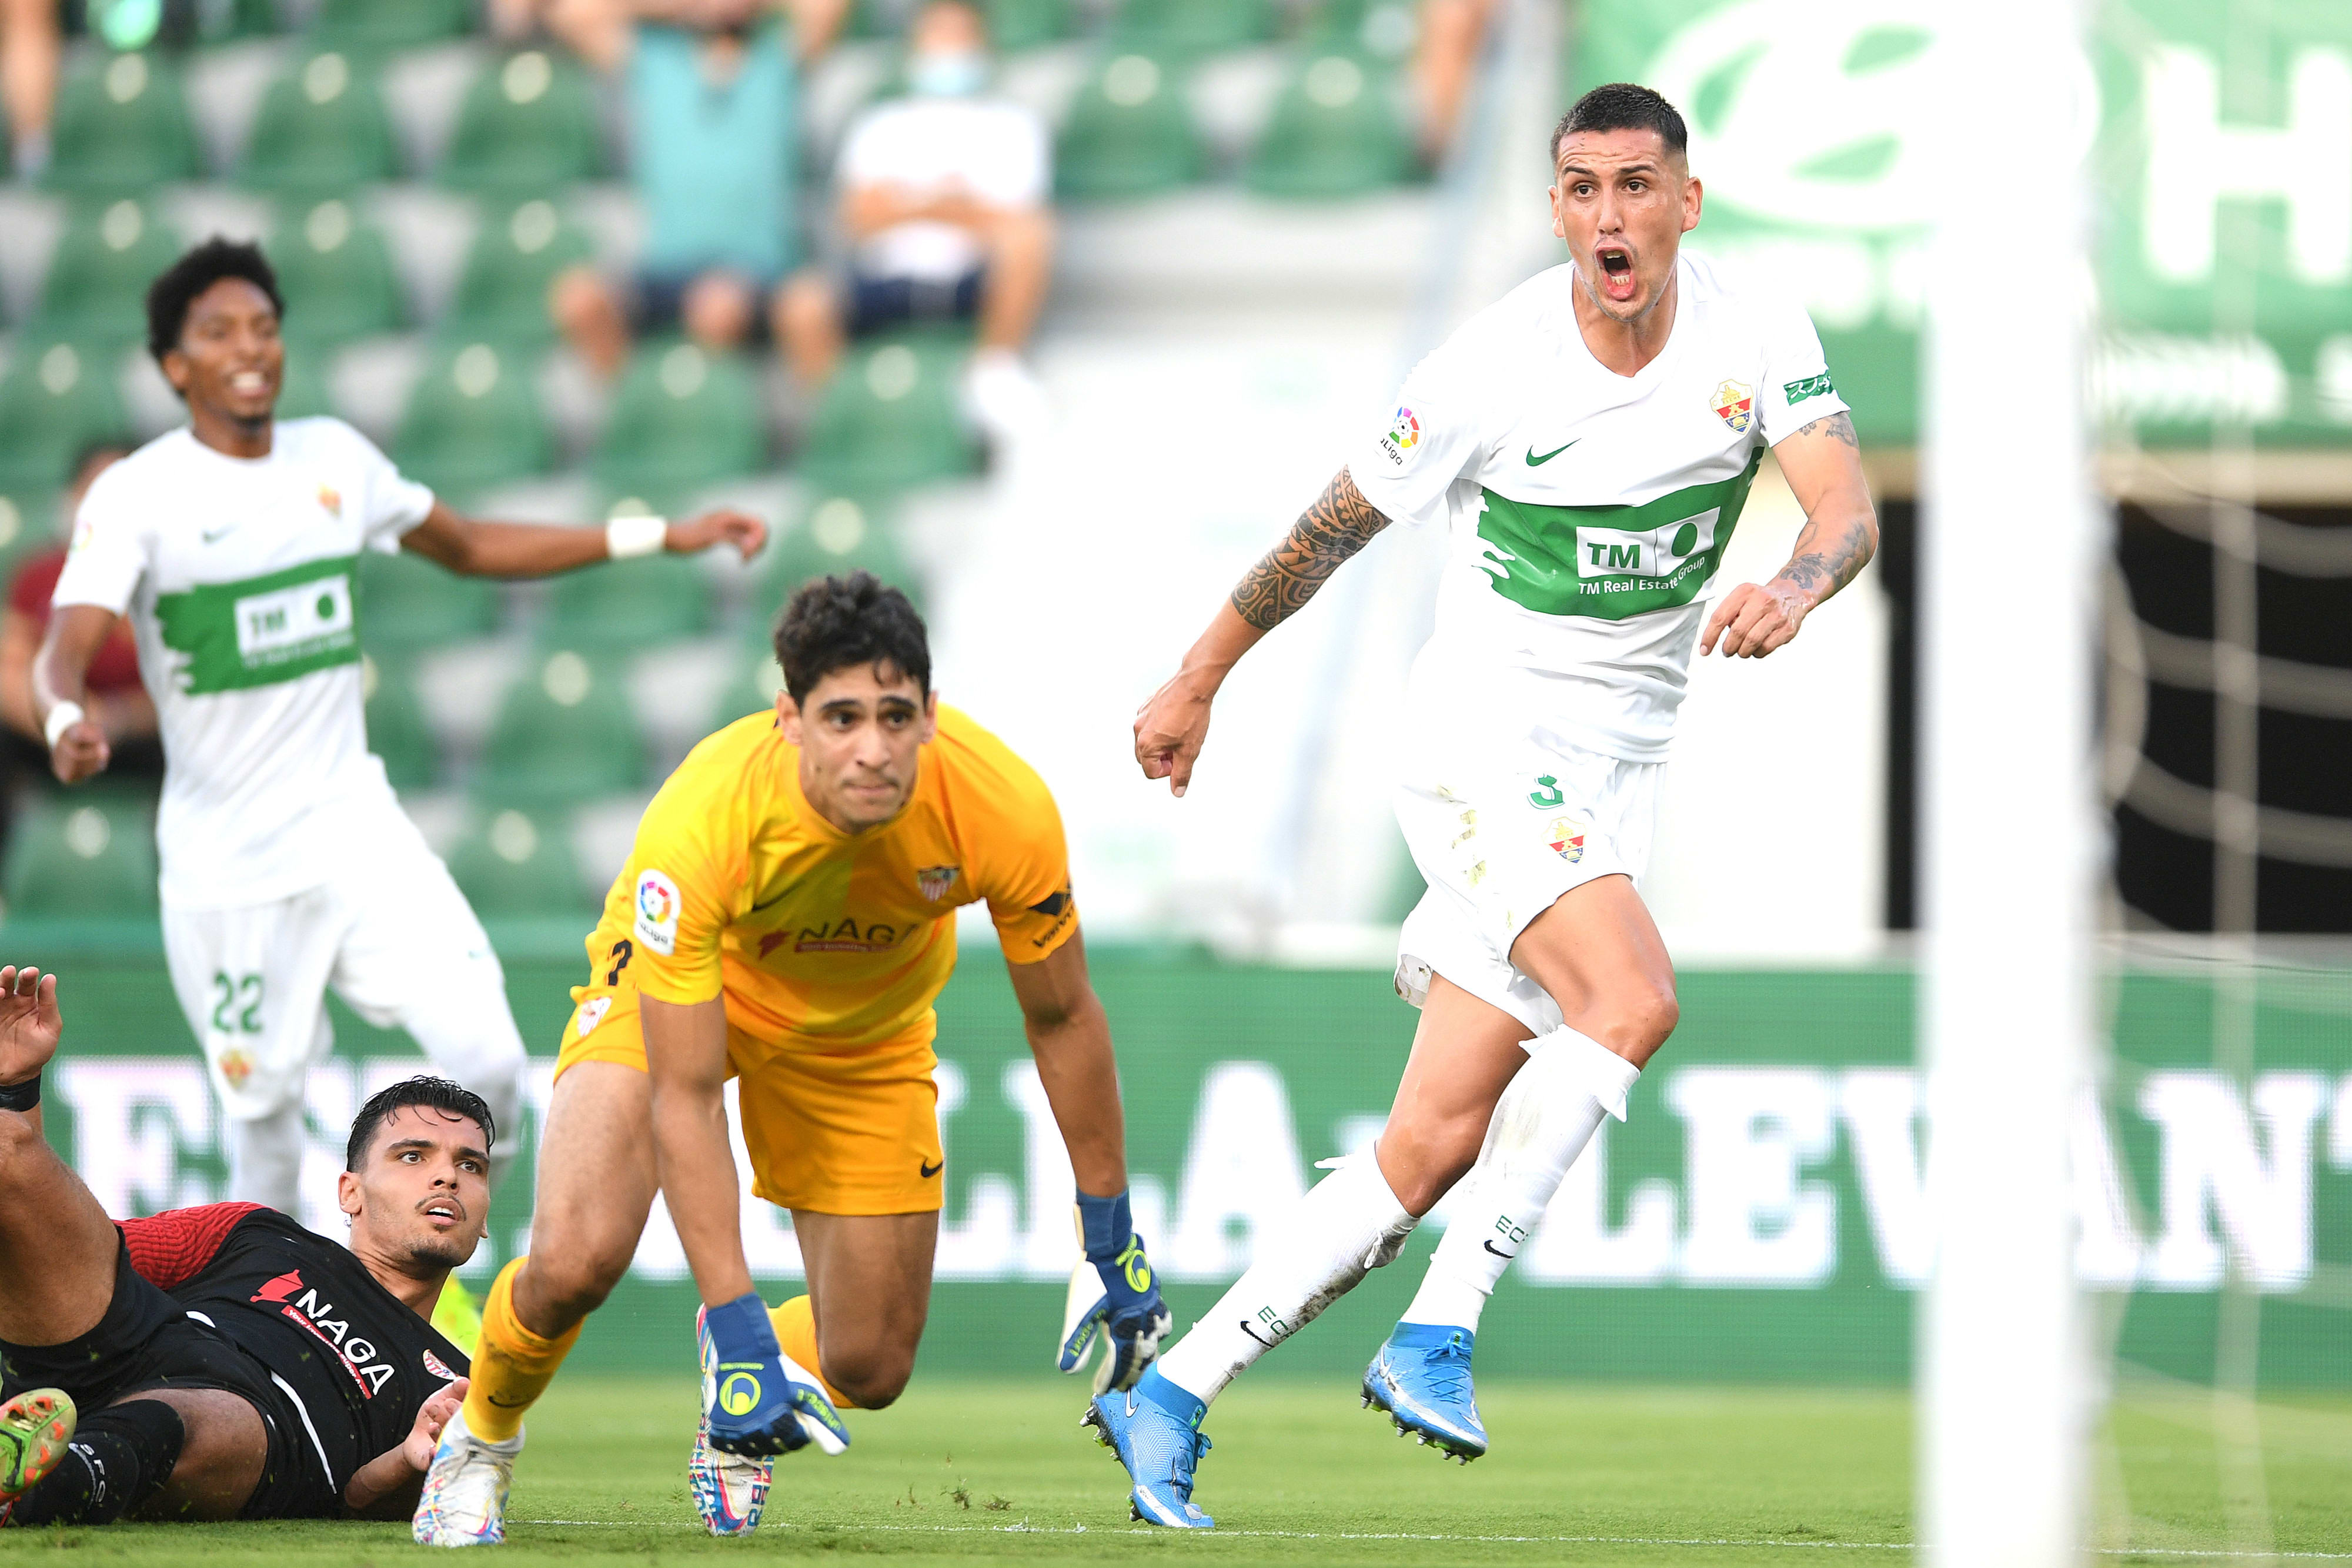 Elsa player Anso Rocco celebrates a goal against Sevilla goalkeeper Yassin Bono